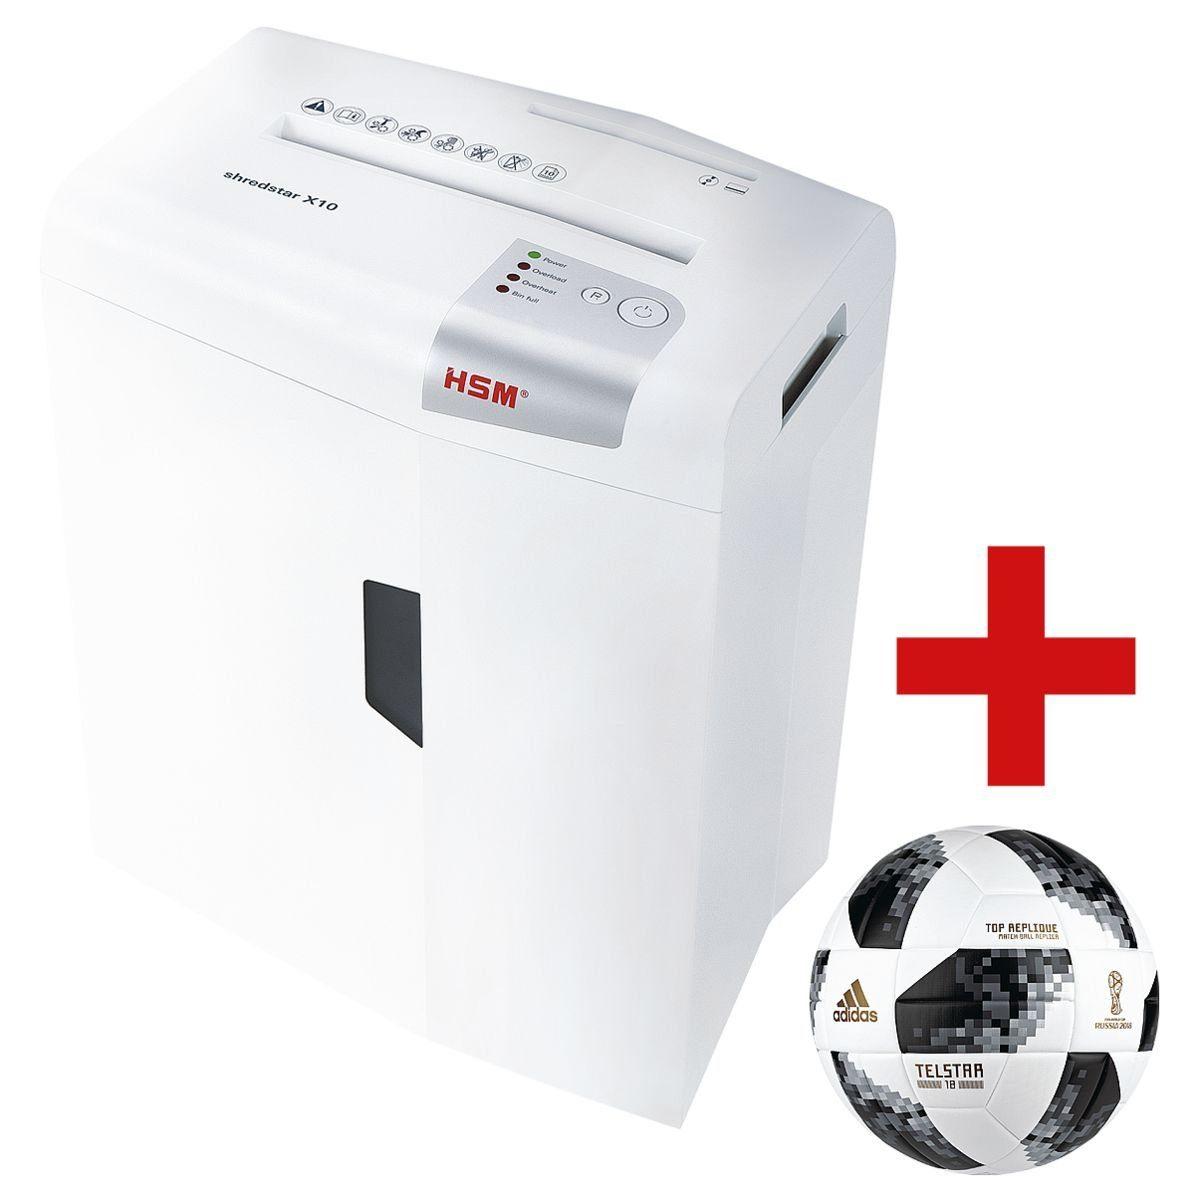 HSM Aktenvernichter inkl. adidas WM-Fußball 2018 »shredstar X10 4,5 x 30 mm« 1 Set